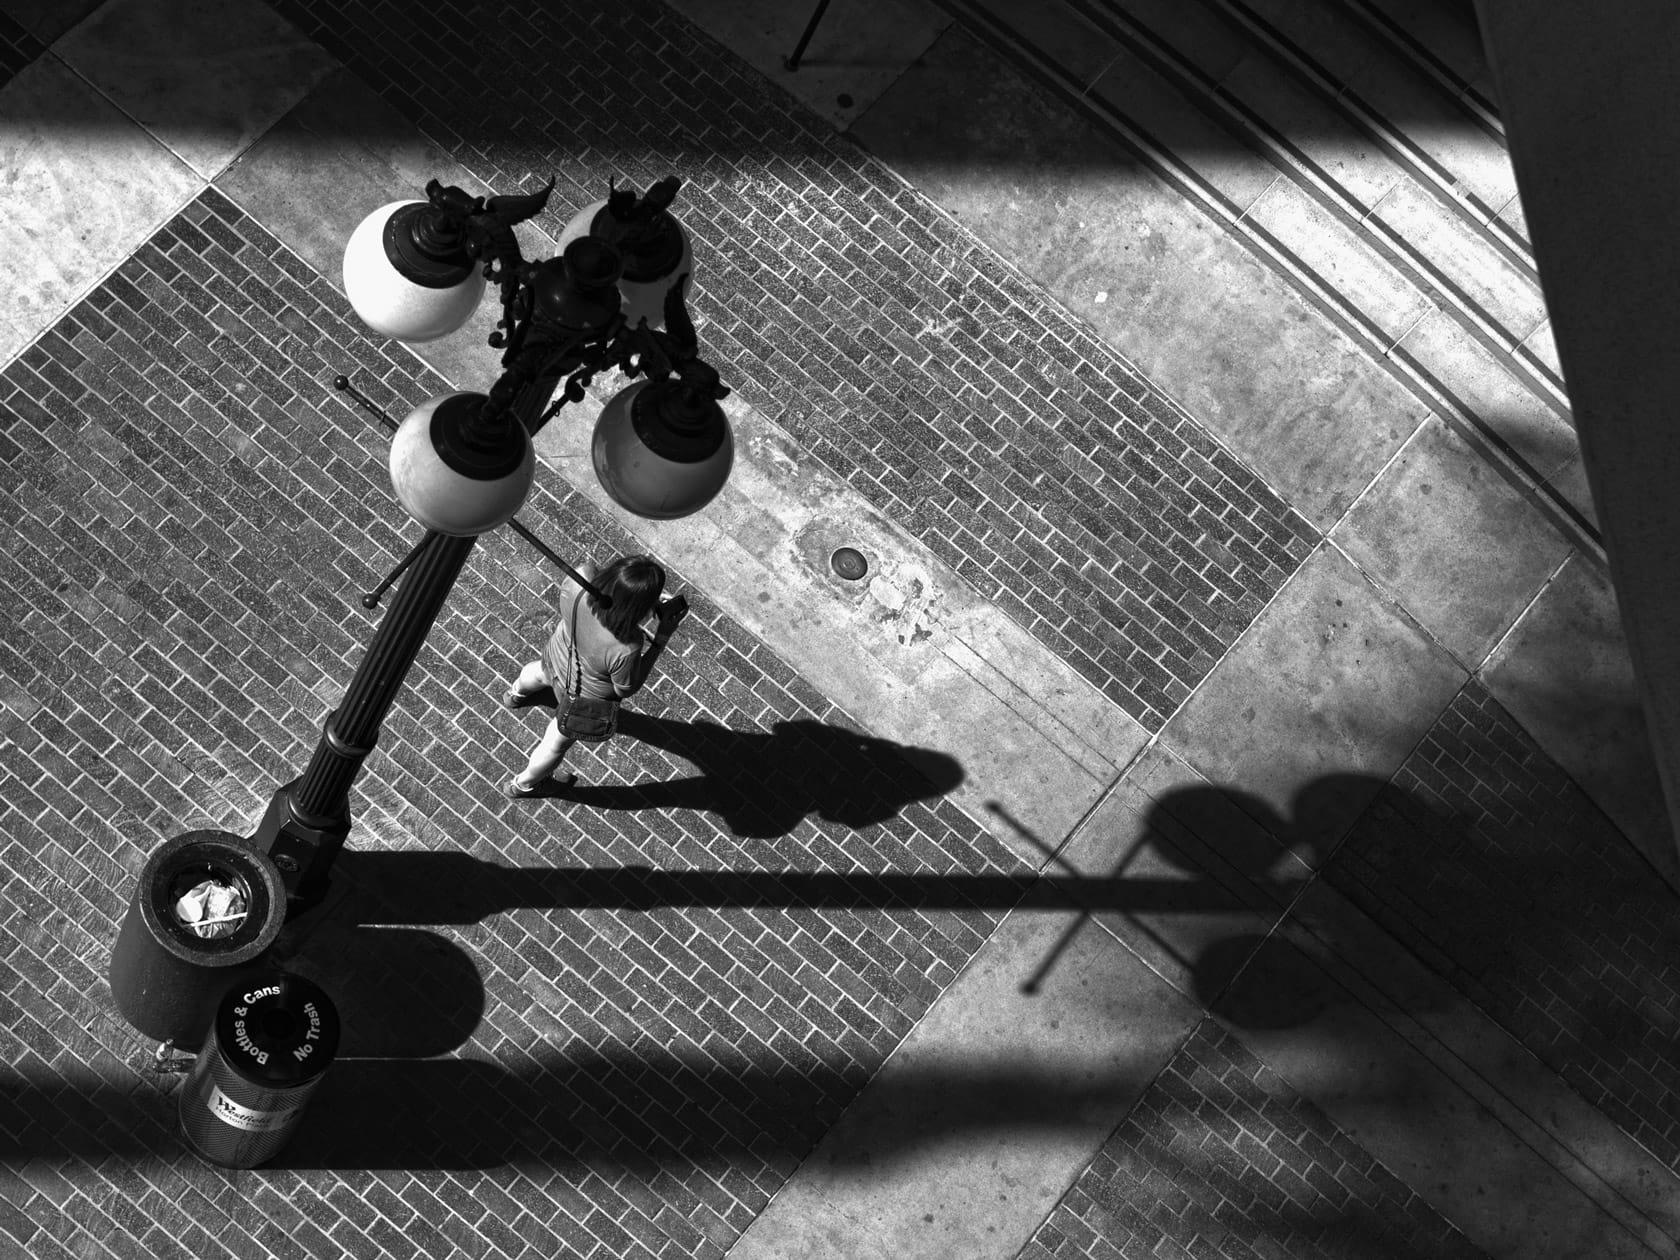 'Near the Lamp Post' by Stuart Liddle